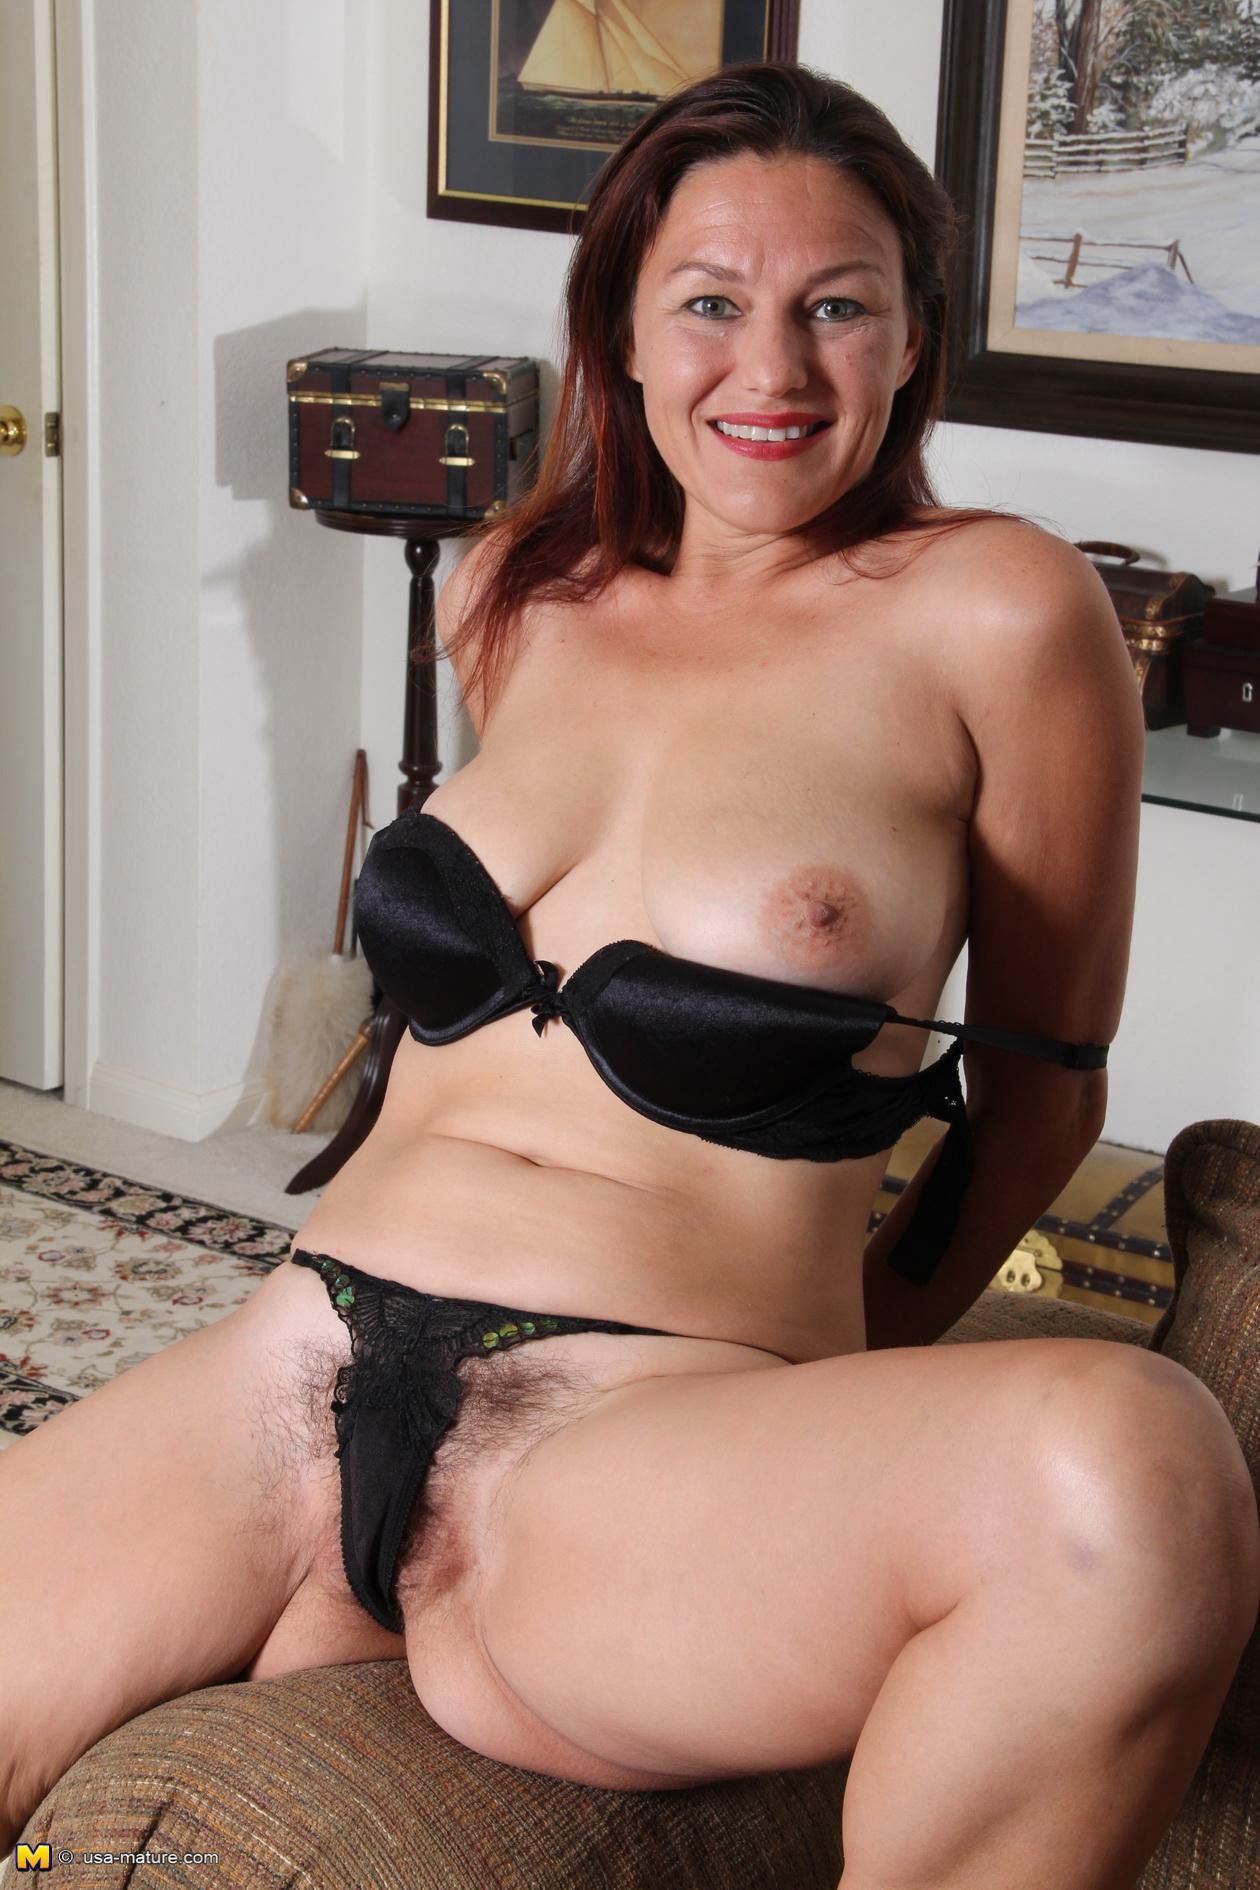 nude photos of ex